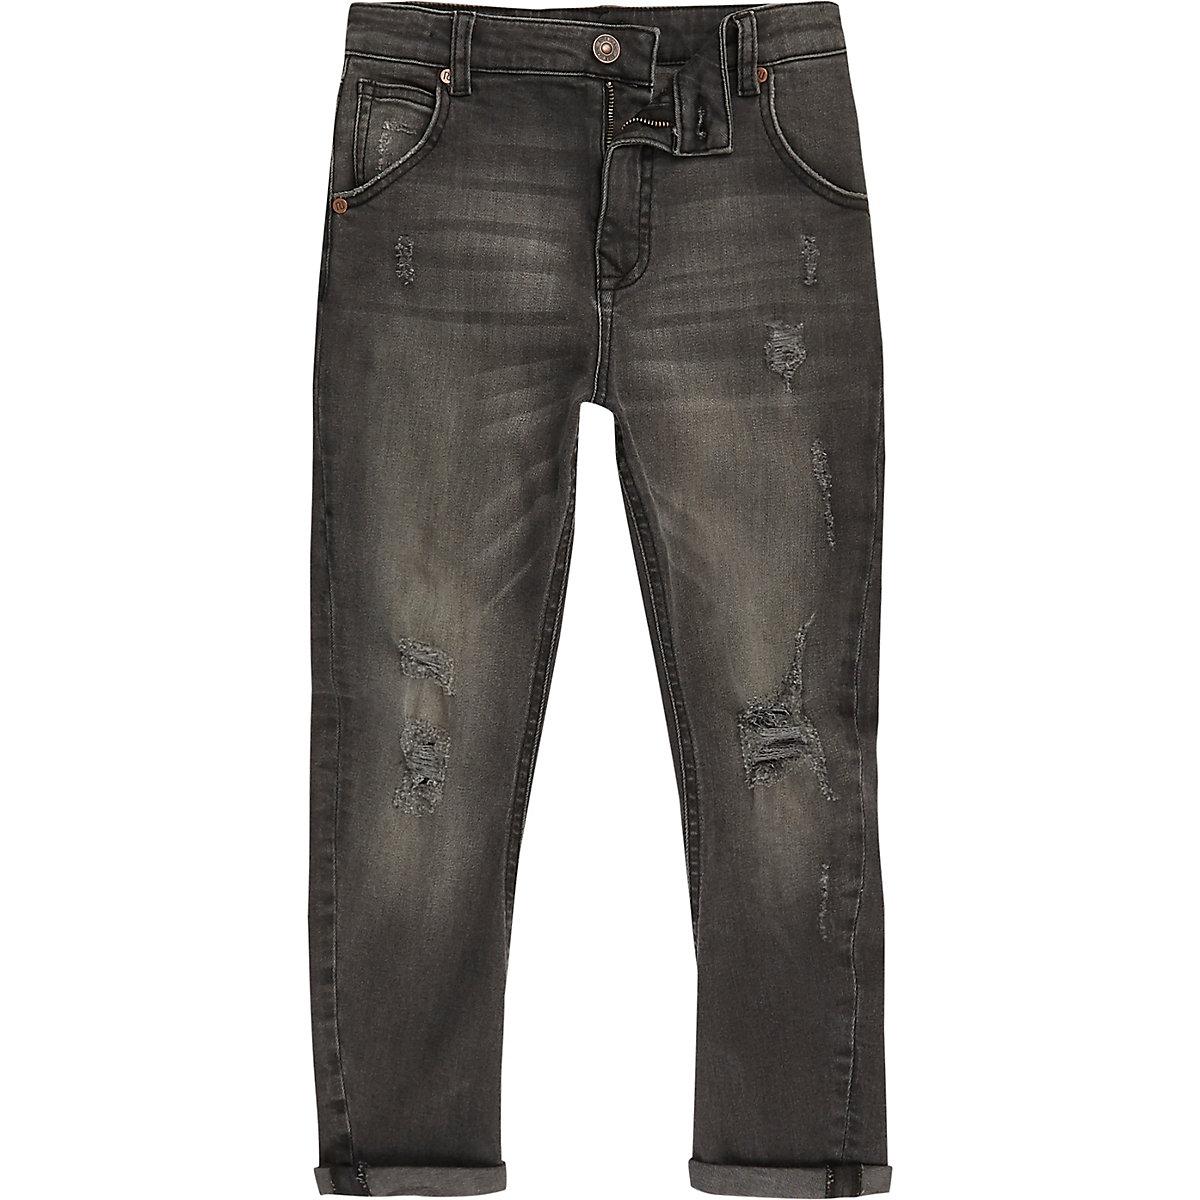 Boys black Tony ripped tapered jeans